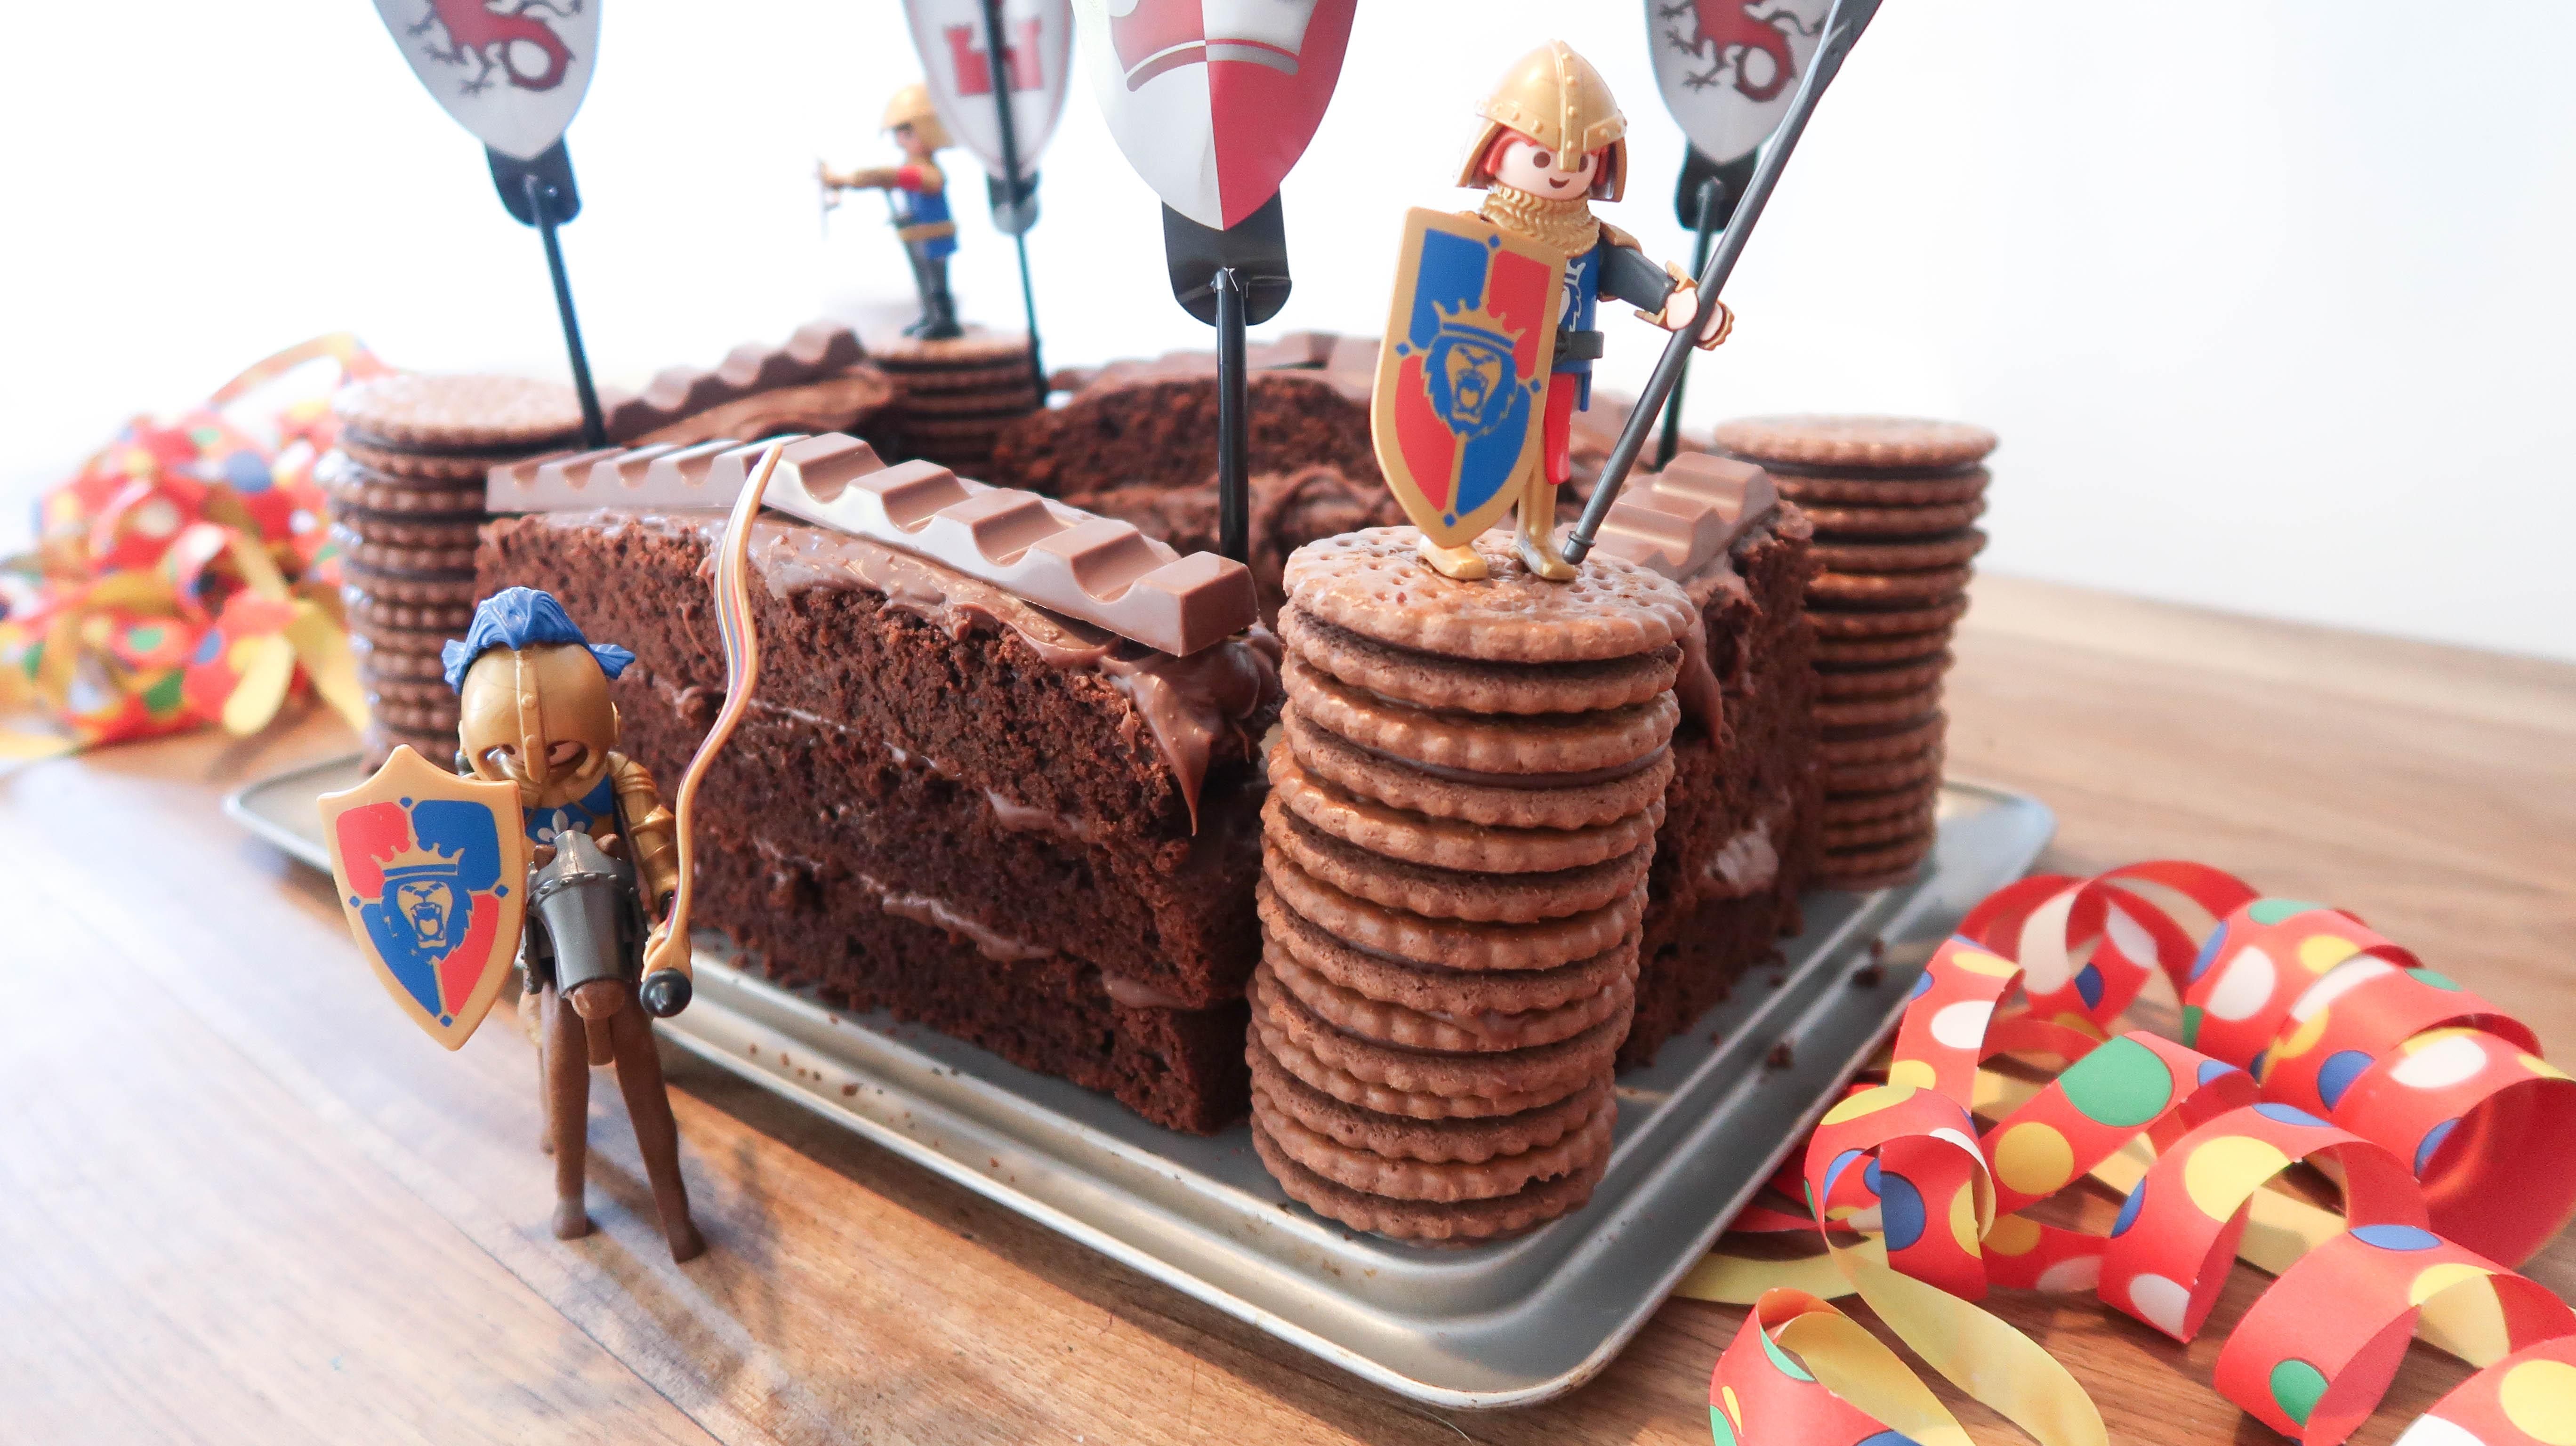 Schokoladen Ritterburg Geburtstagskuchen Fur Echte Ritter